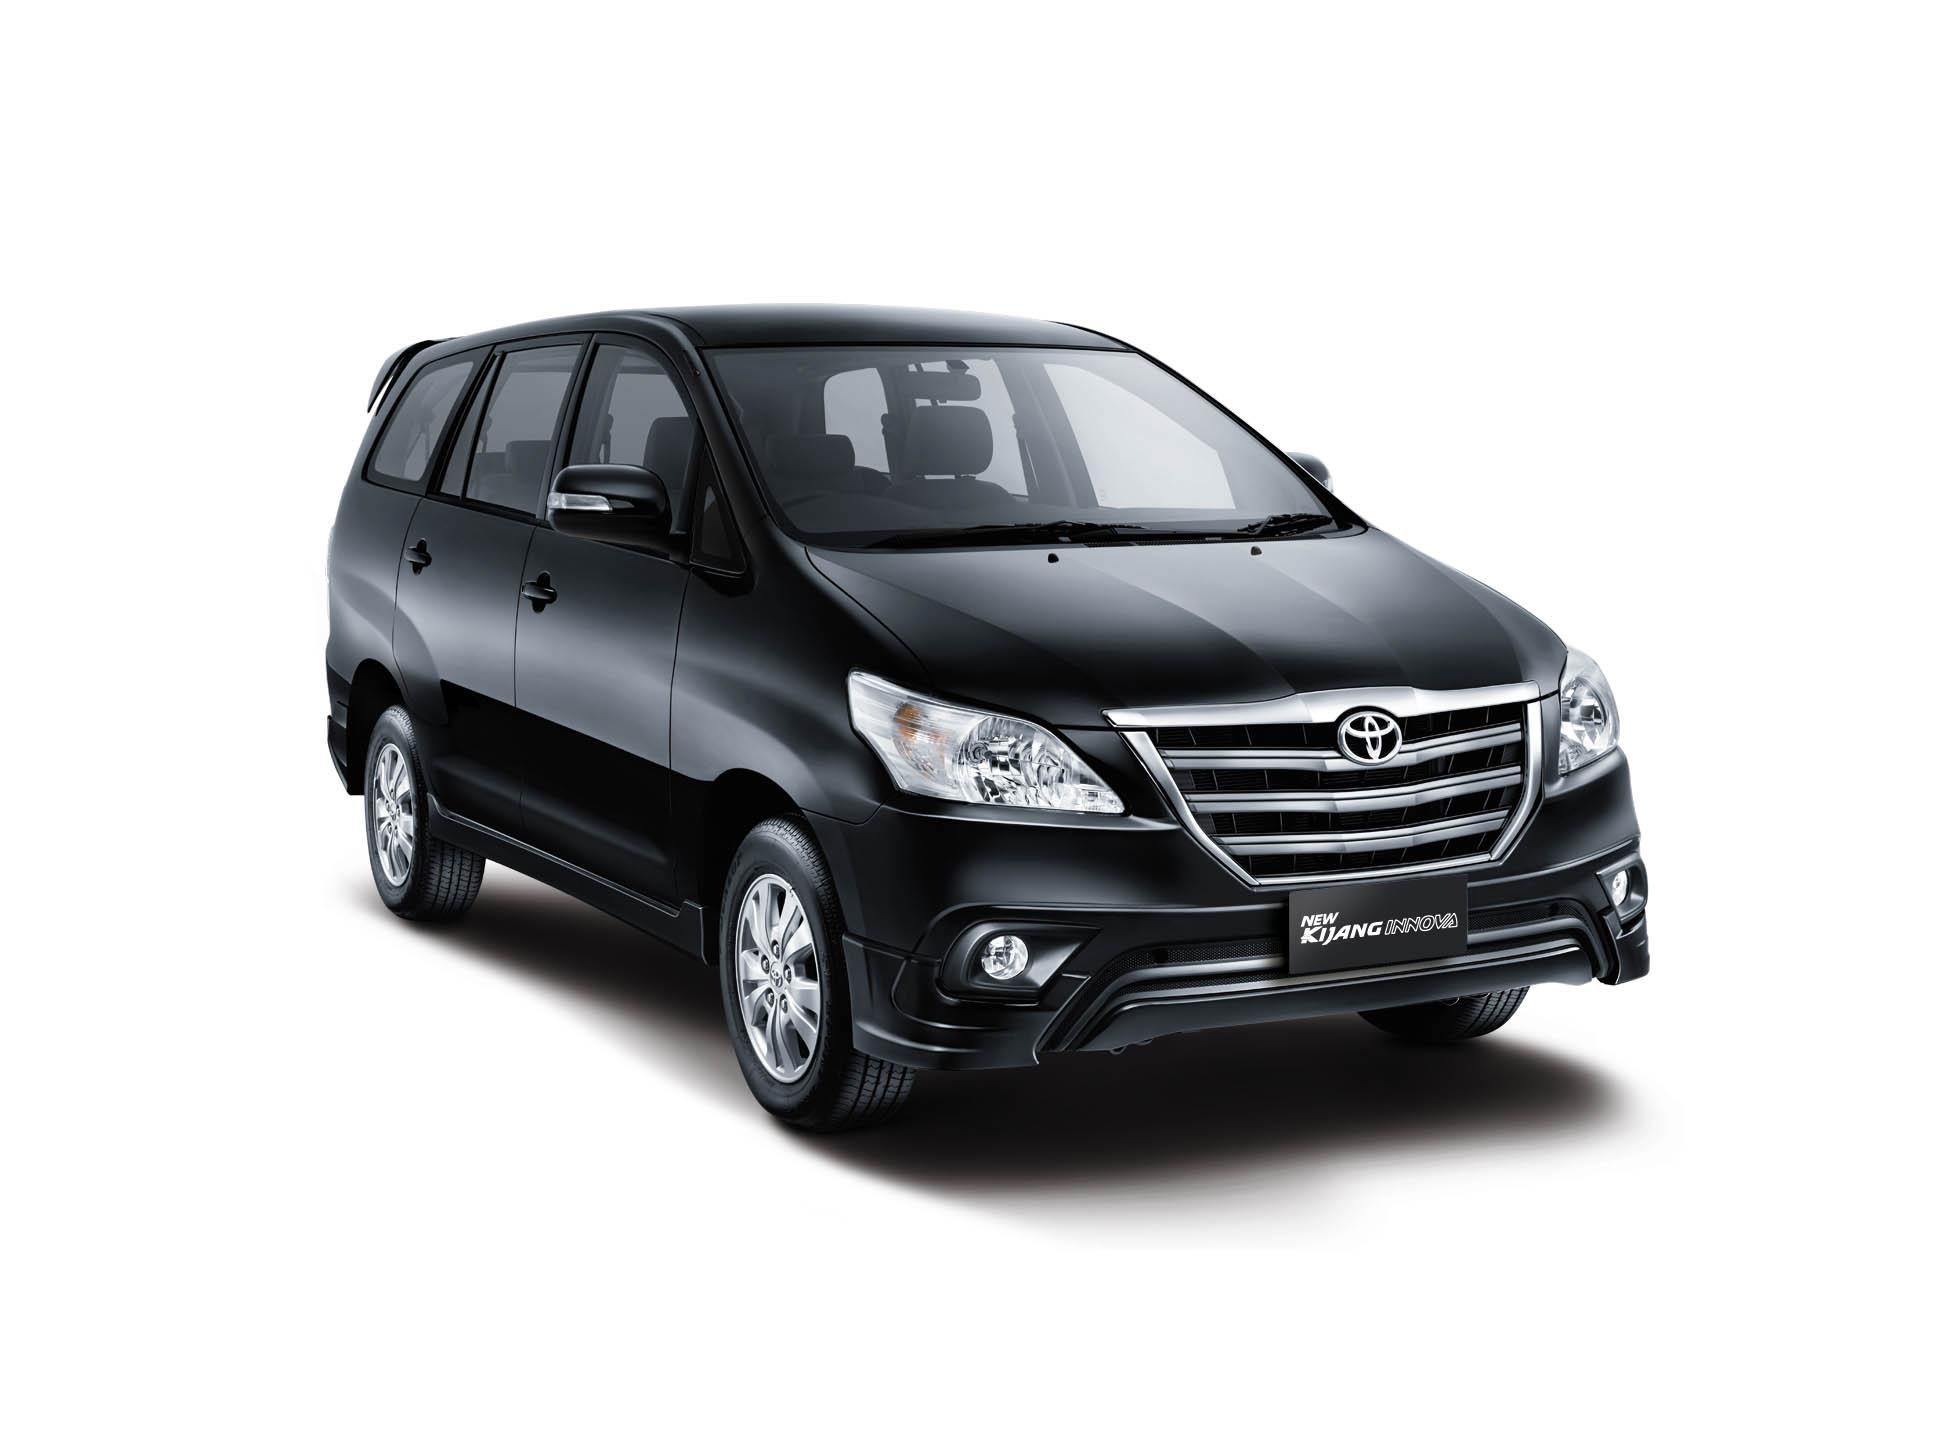 Toyota Kijang Innova 2013 Tipe G